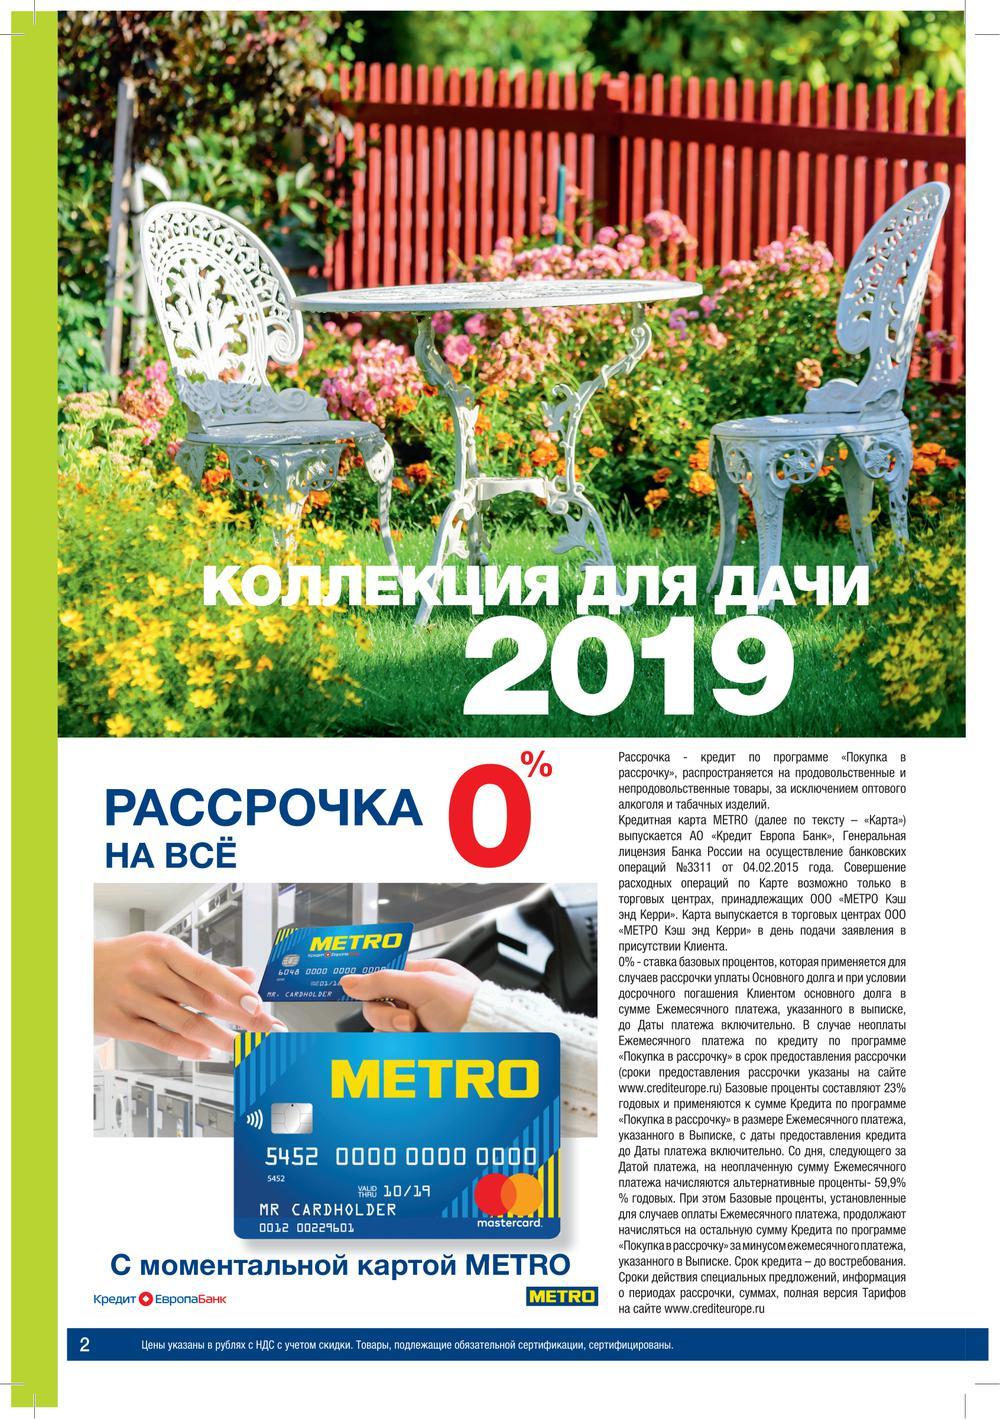 карта метро от кредит европа банк карта тахографа челябинск срочно